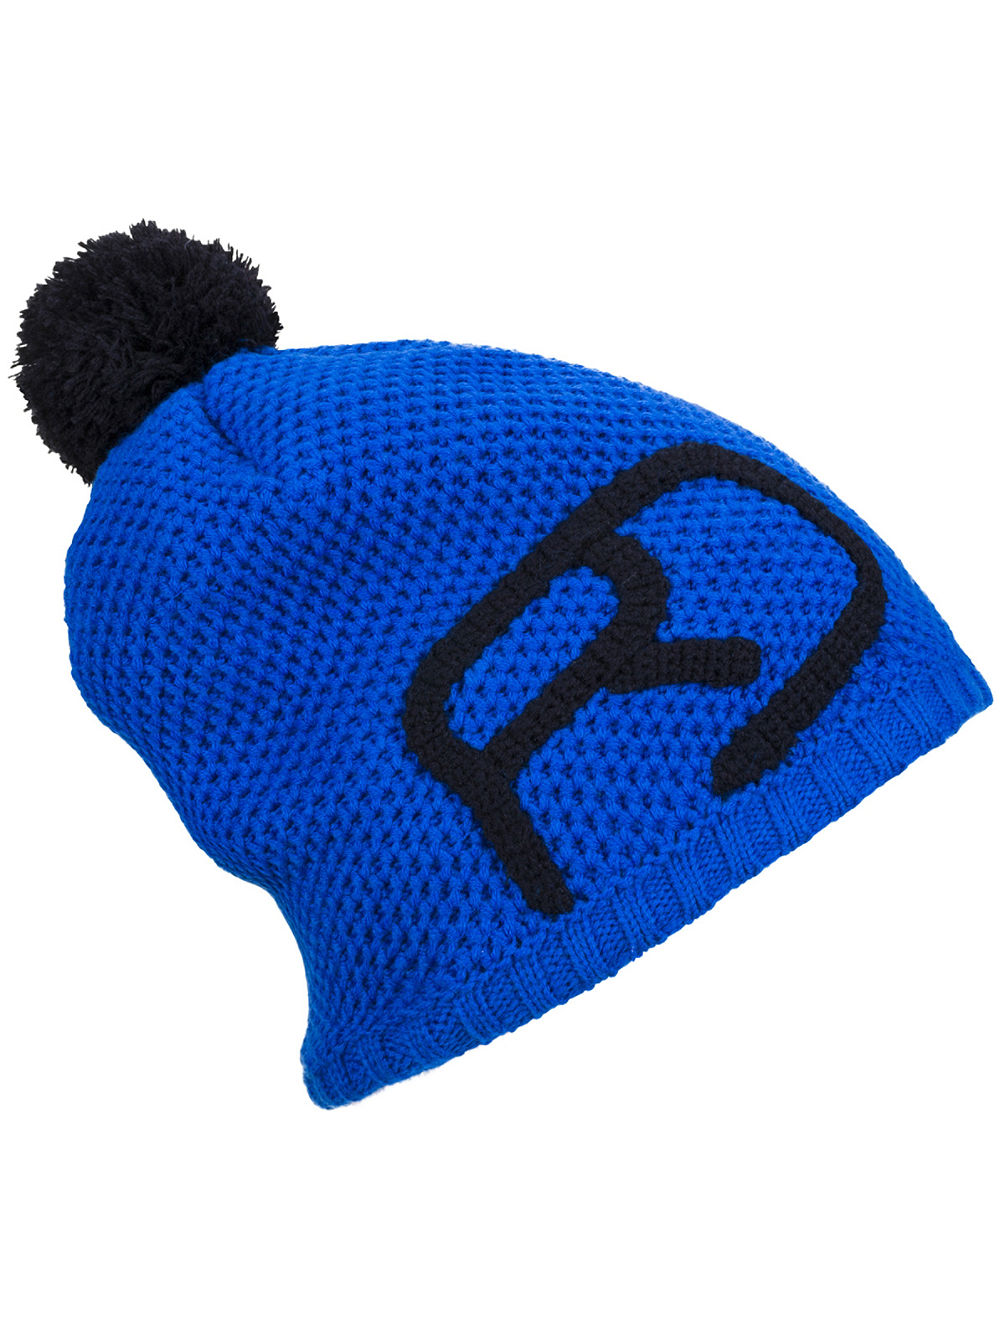 Compra Ortovox Rock 'N' Wool Beanie en línea en blue ...